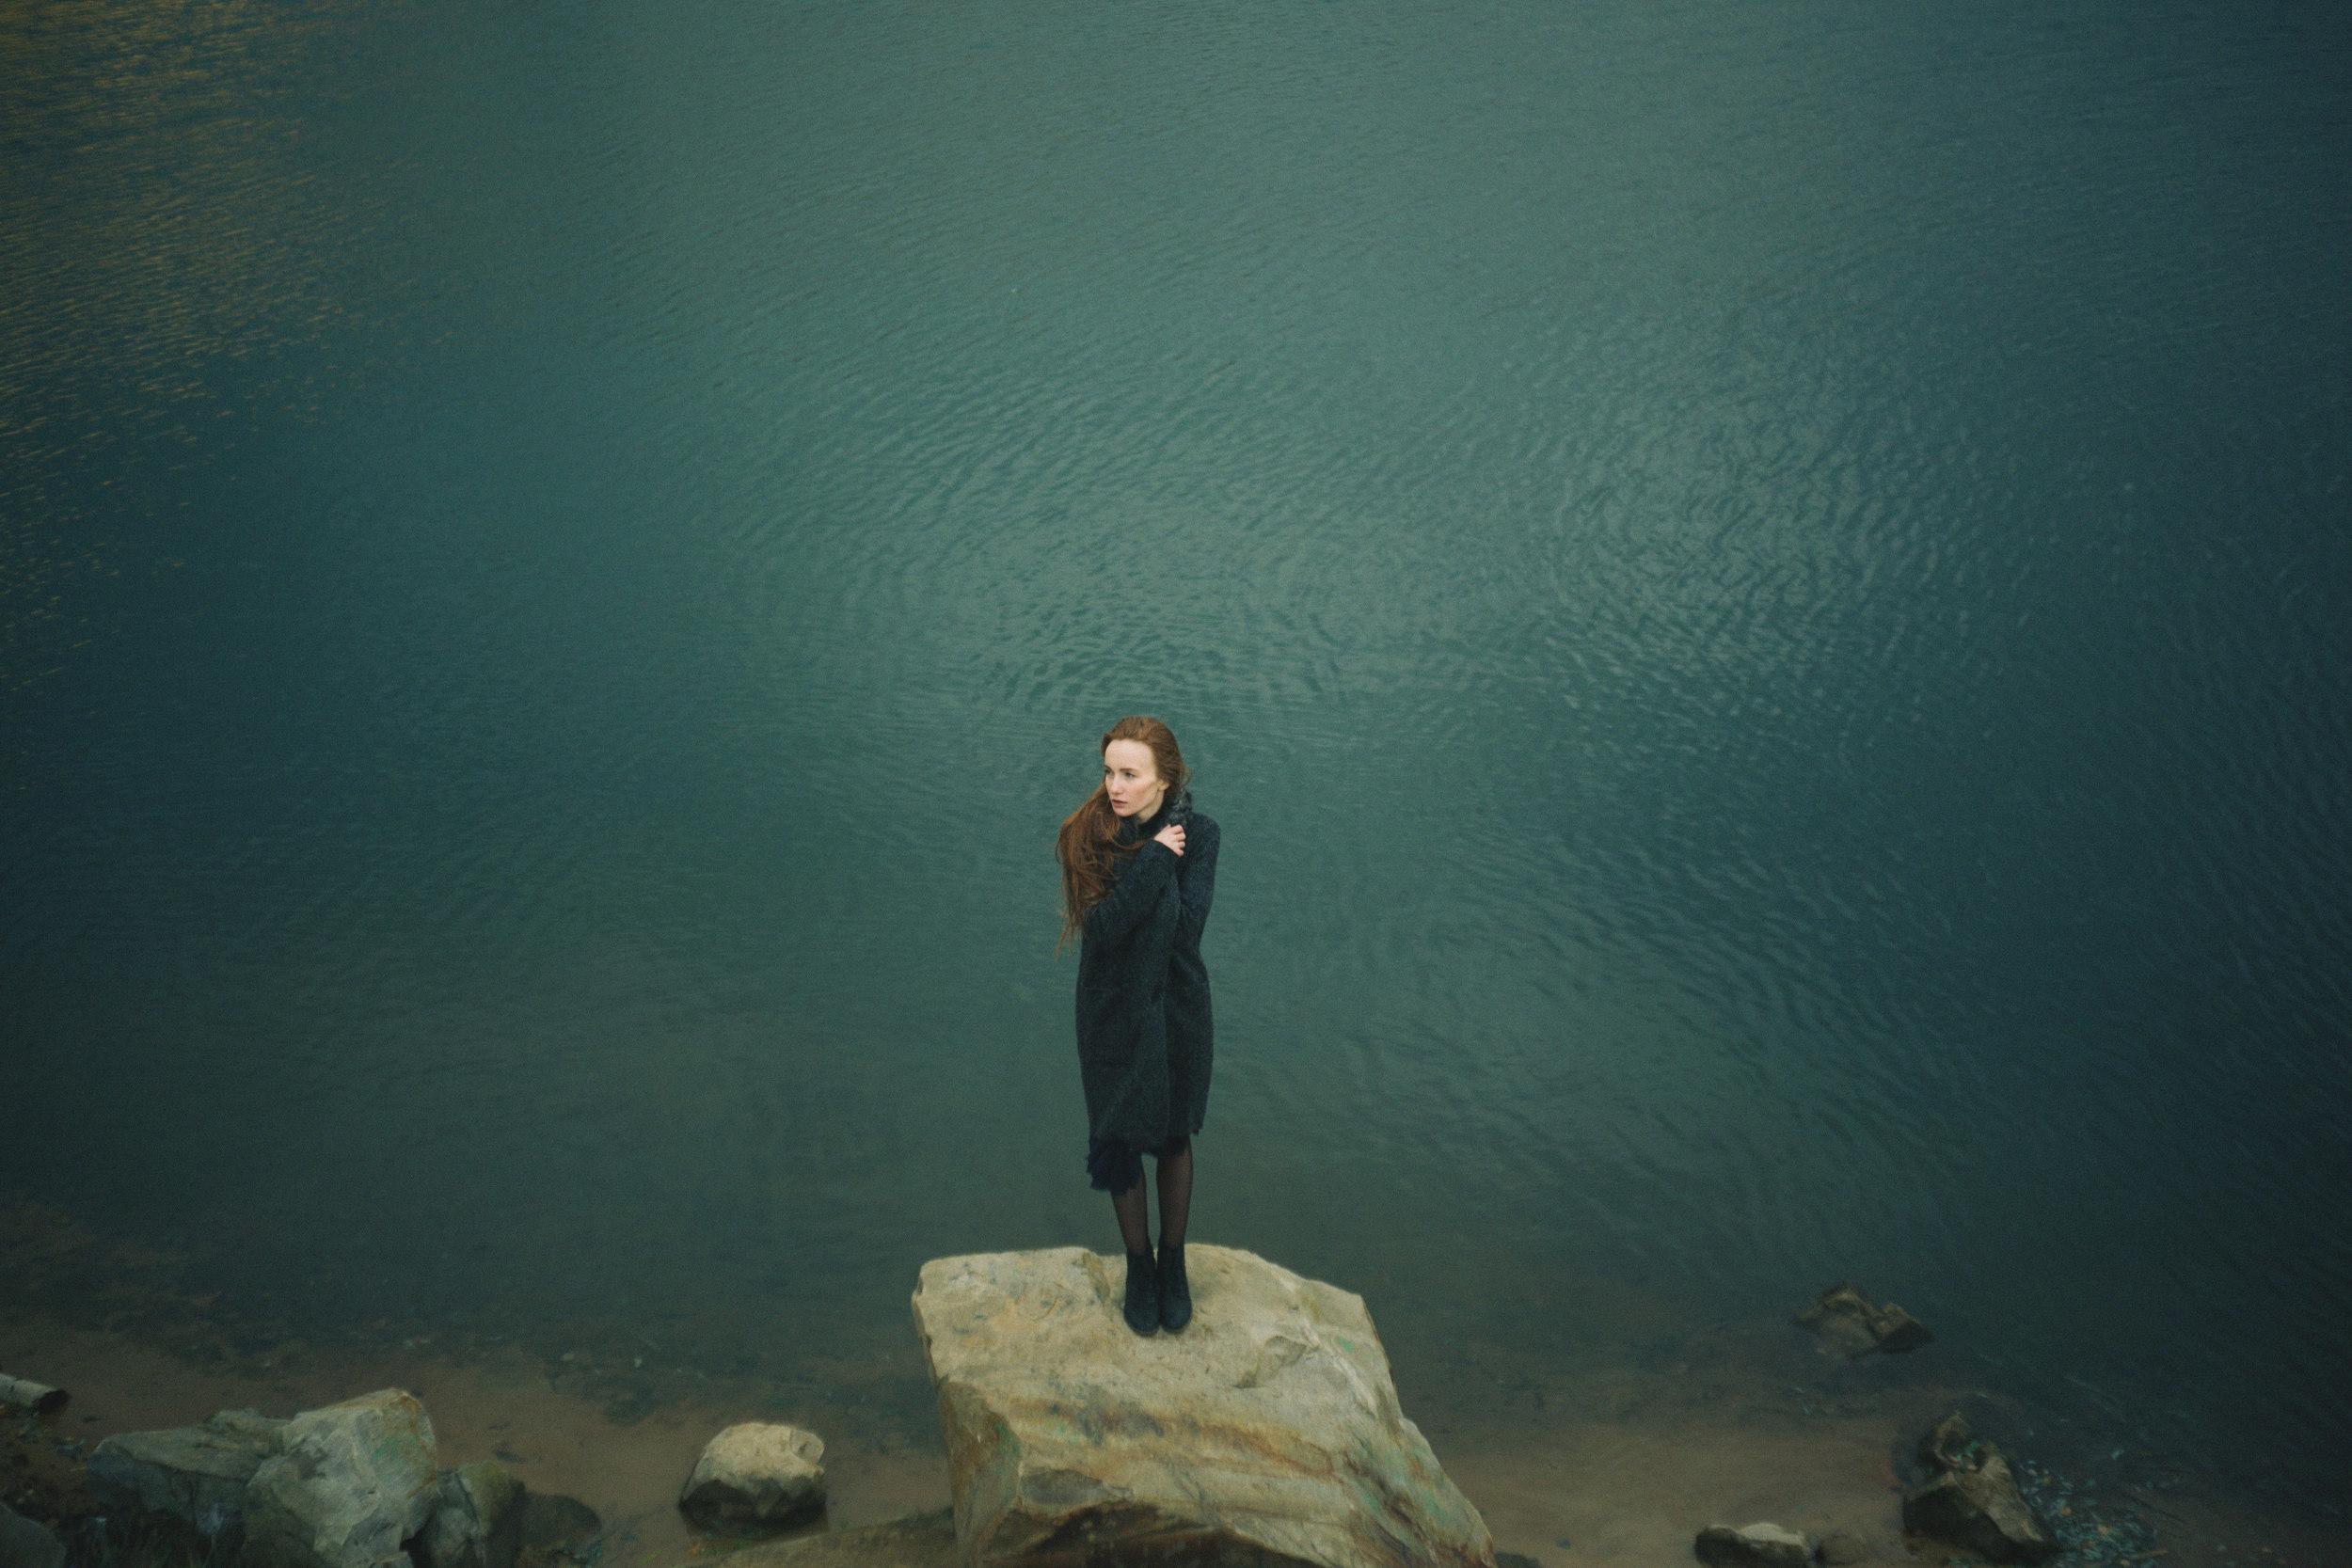 Dark Night of the Soul: Depression or Spiritual Path